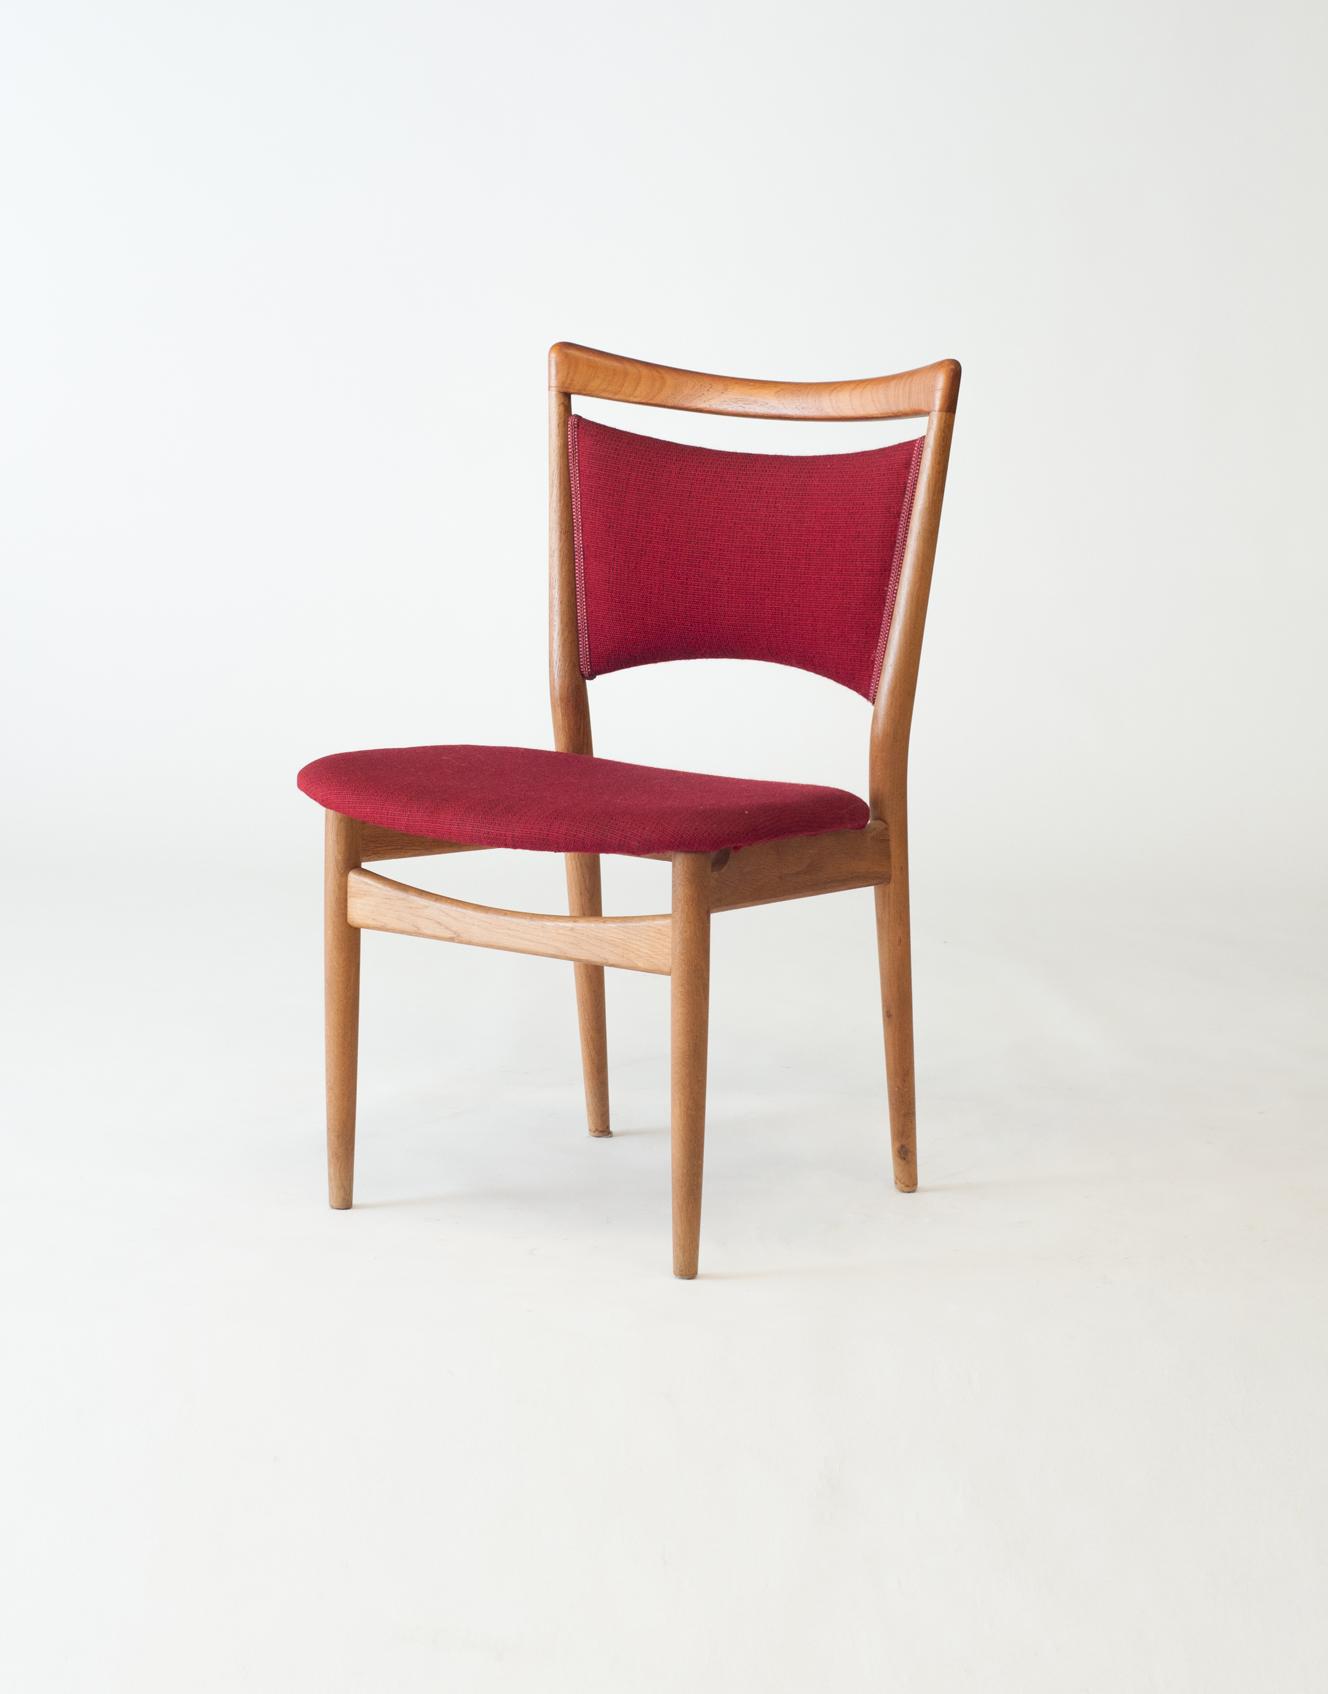 Søren Willadsen SW86 Teak and Oak Dining Chair